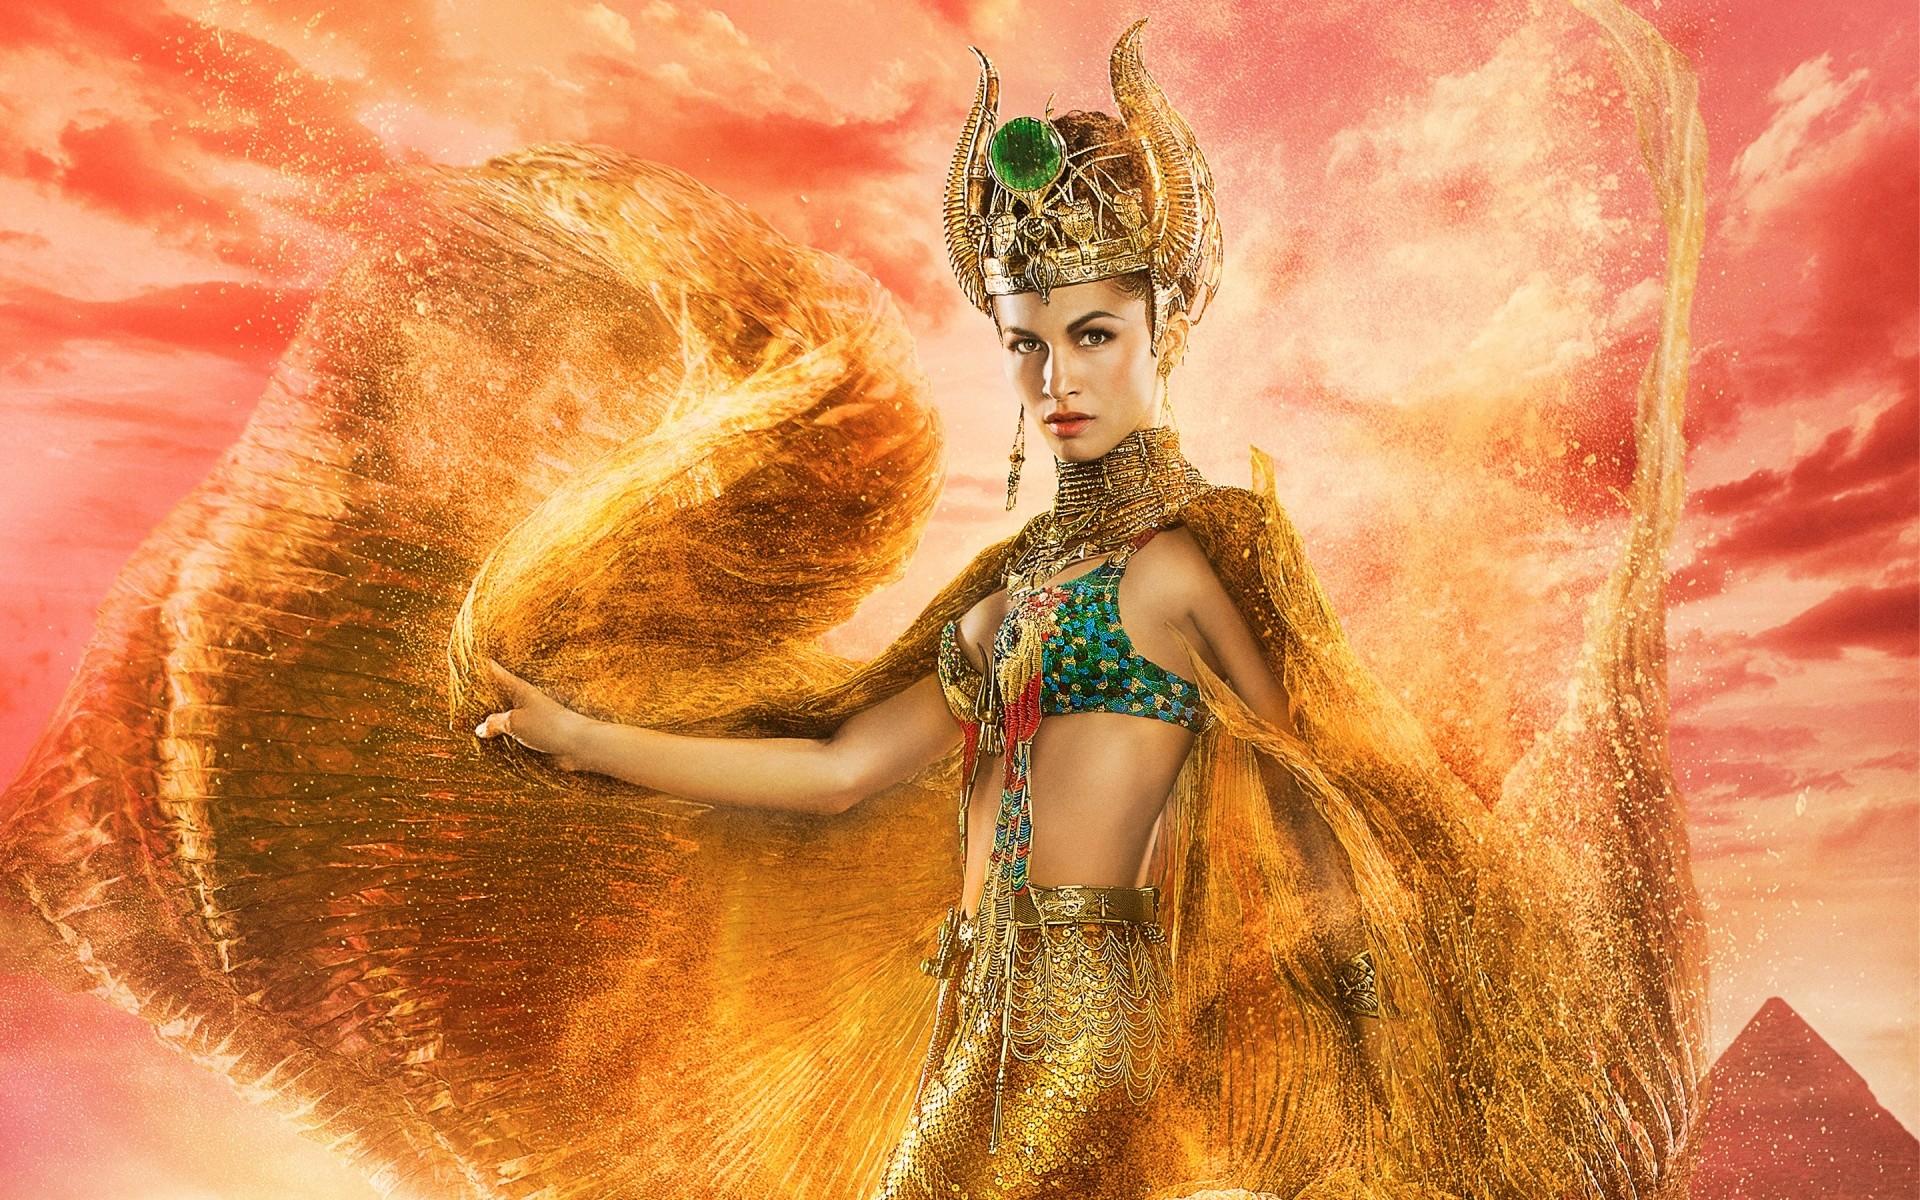 Hathor Goddess of Love Gods of Egypt Wallpapers | HD Wallpapers